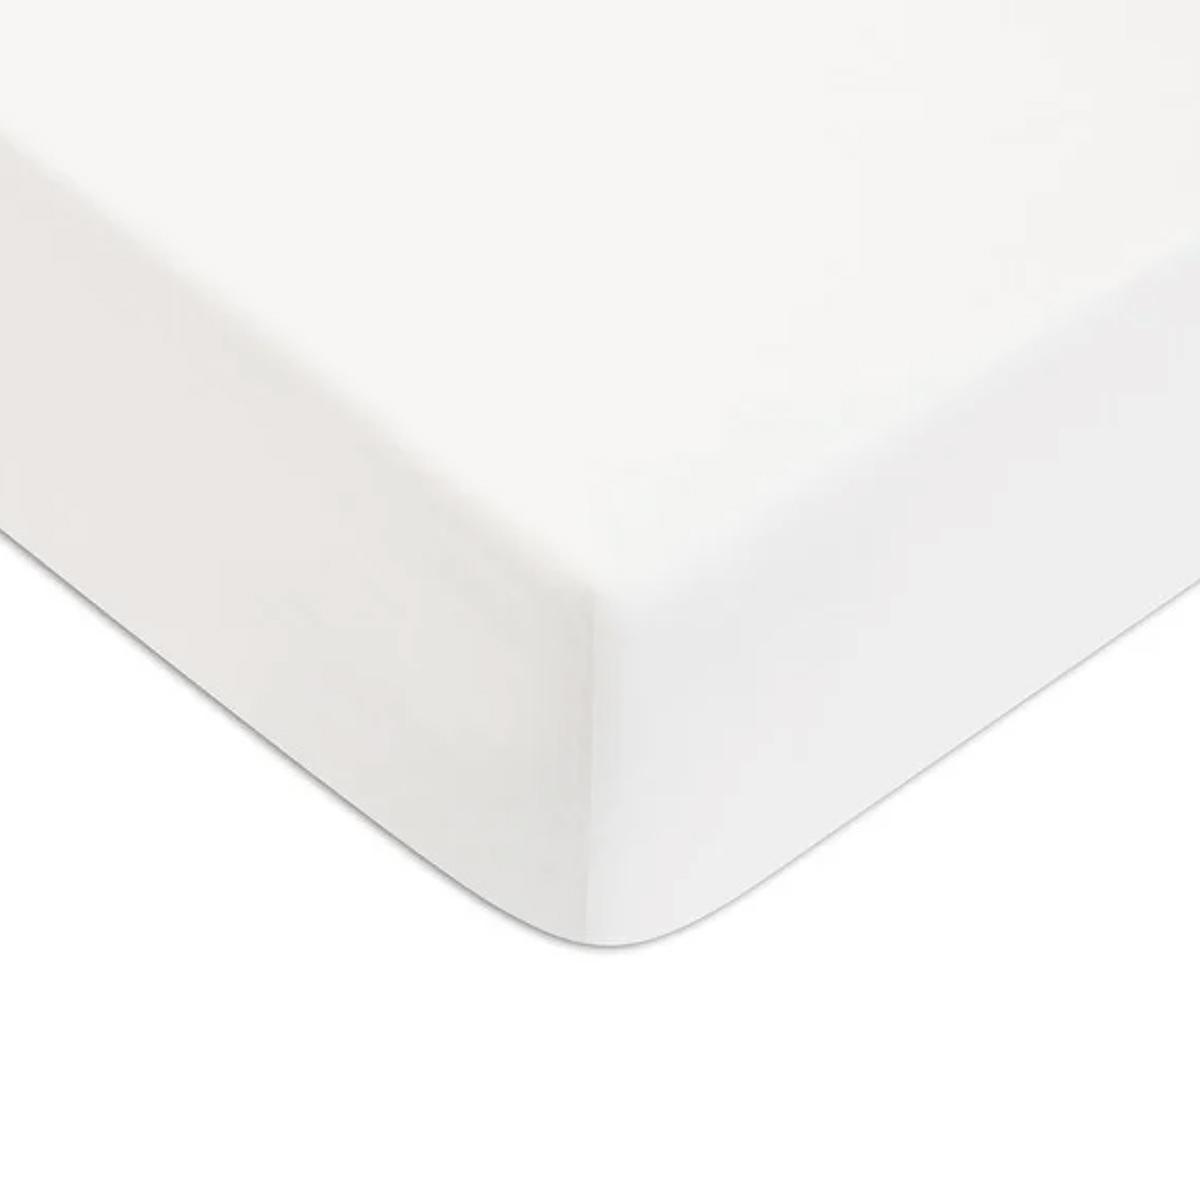 Drap housse Blanc 140x200cm 57 fils